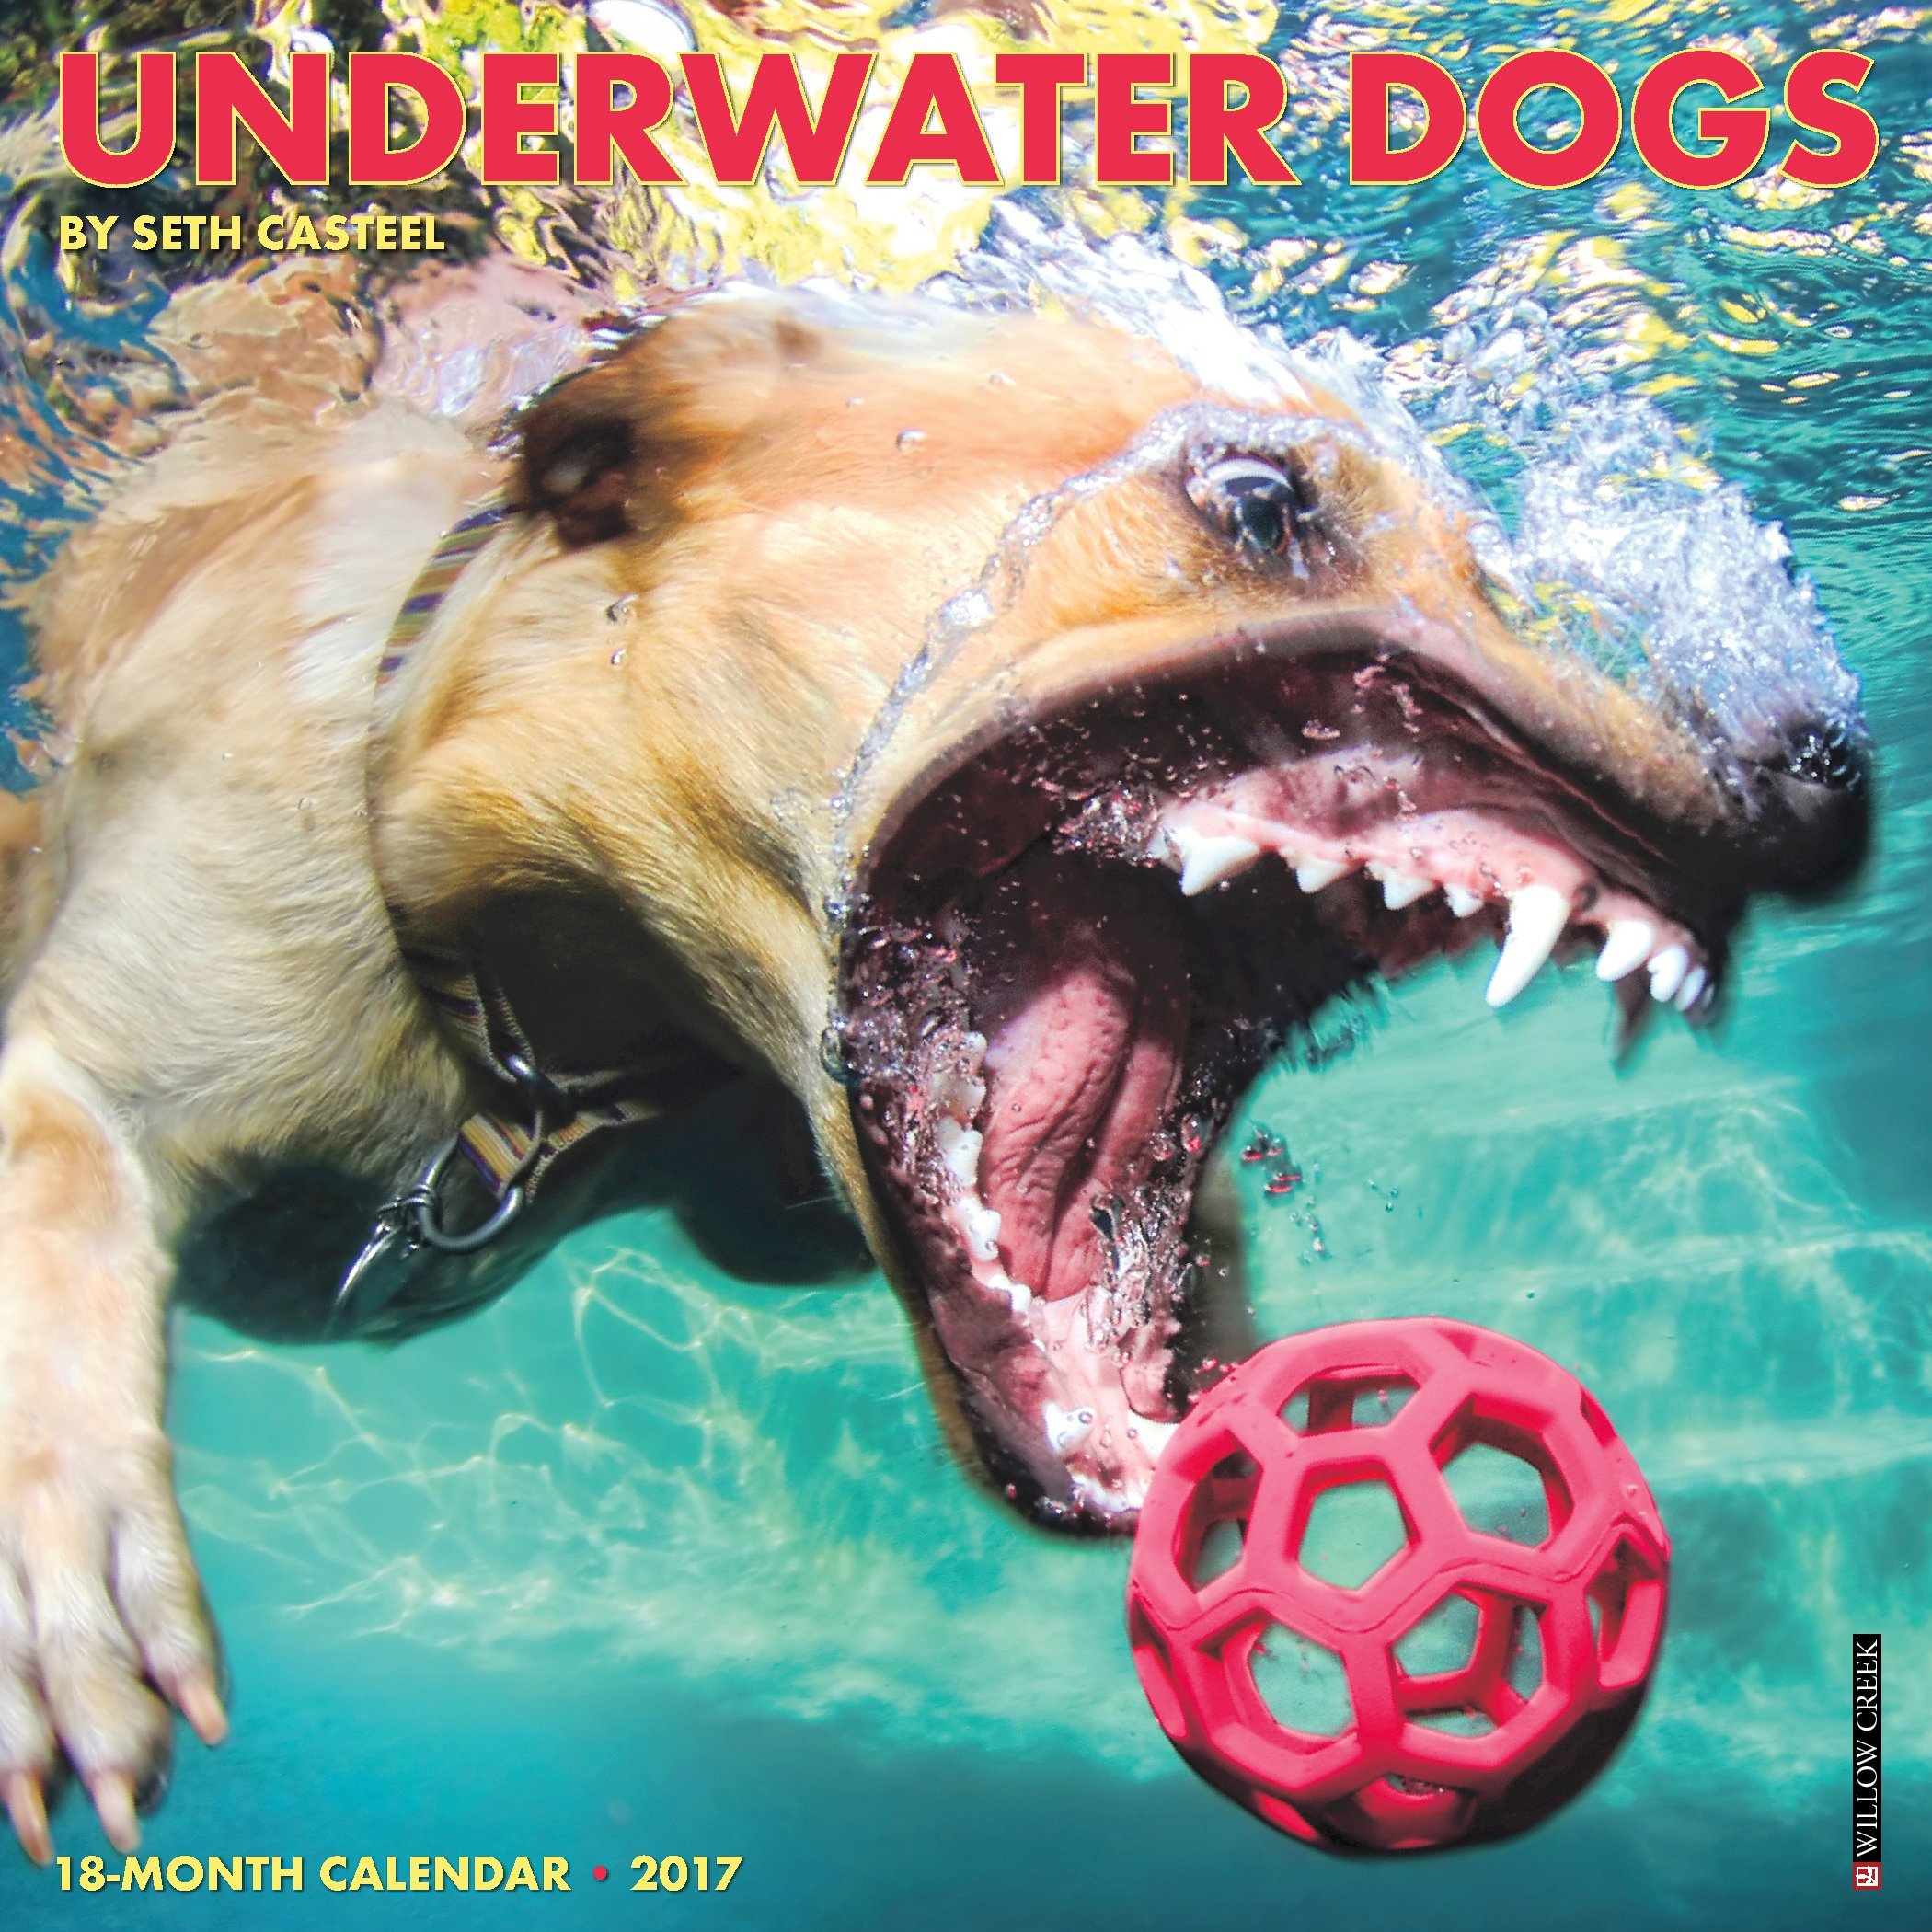 2017 Underwater Dogs Mini Calendar product image